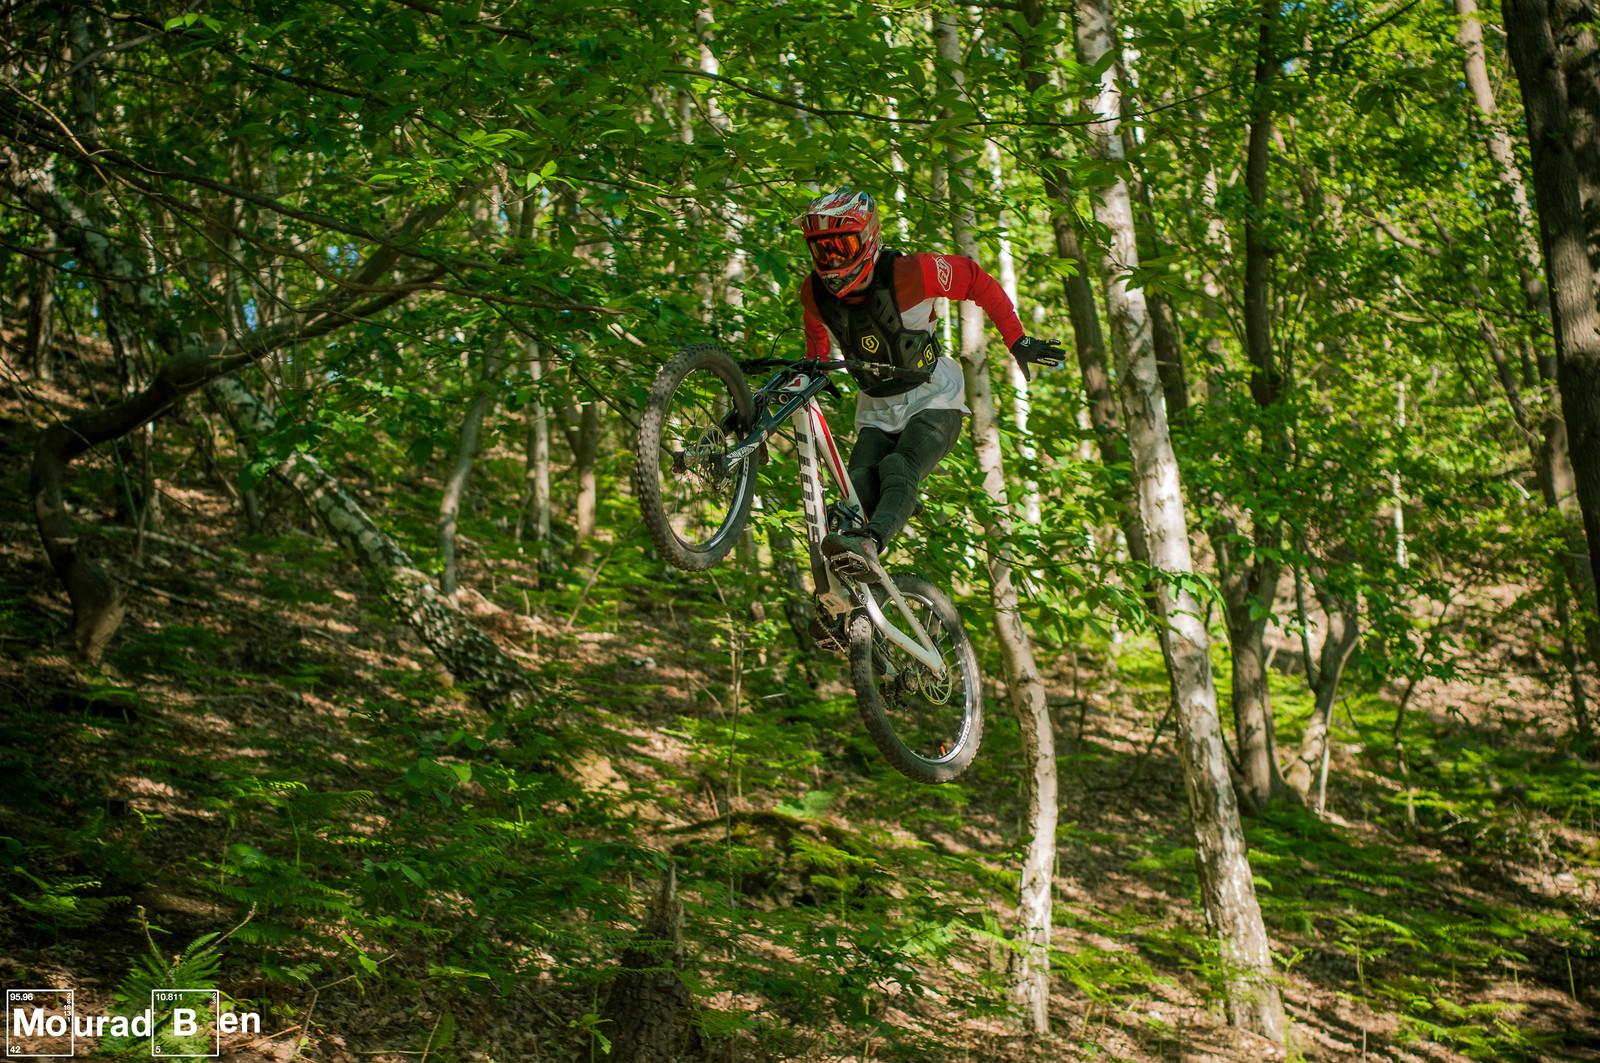 No hander - Romuald_Manach - Mountain Biking Pictures - Vital MTB